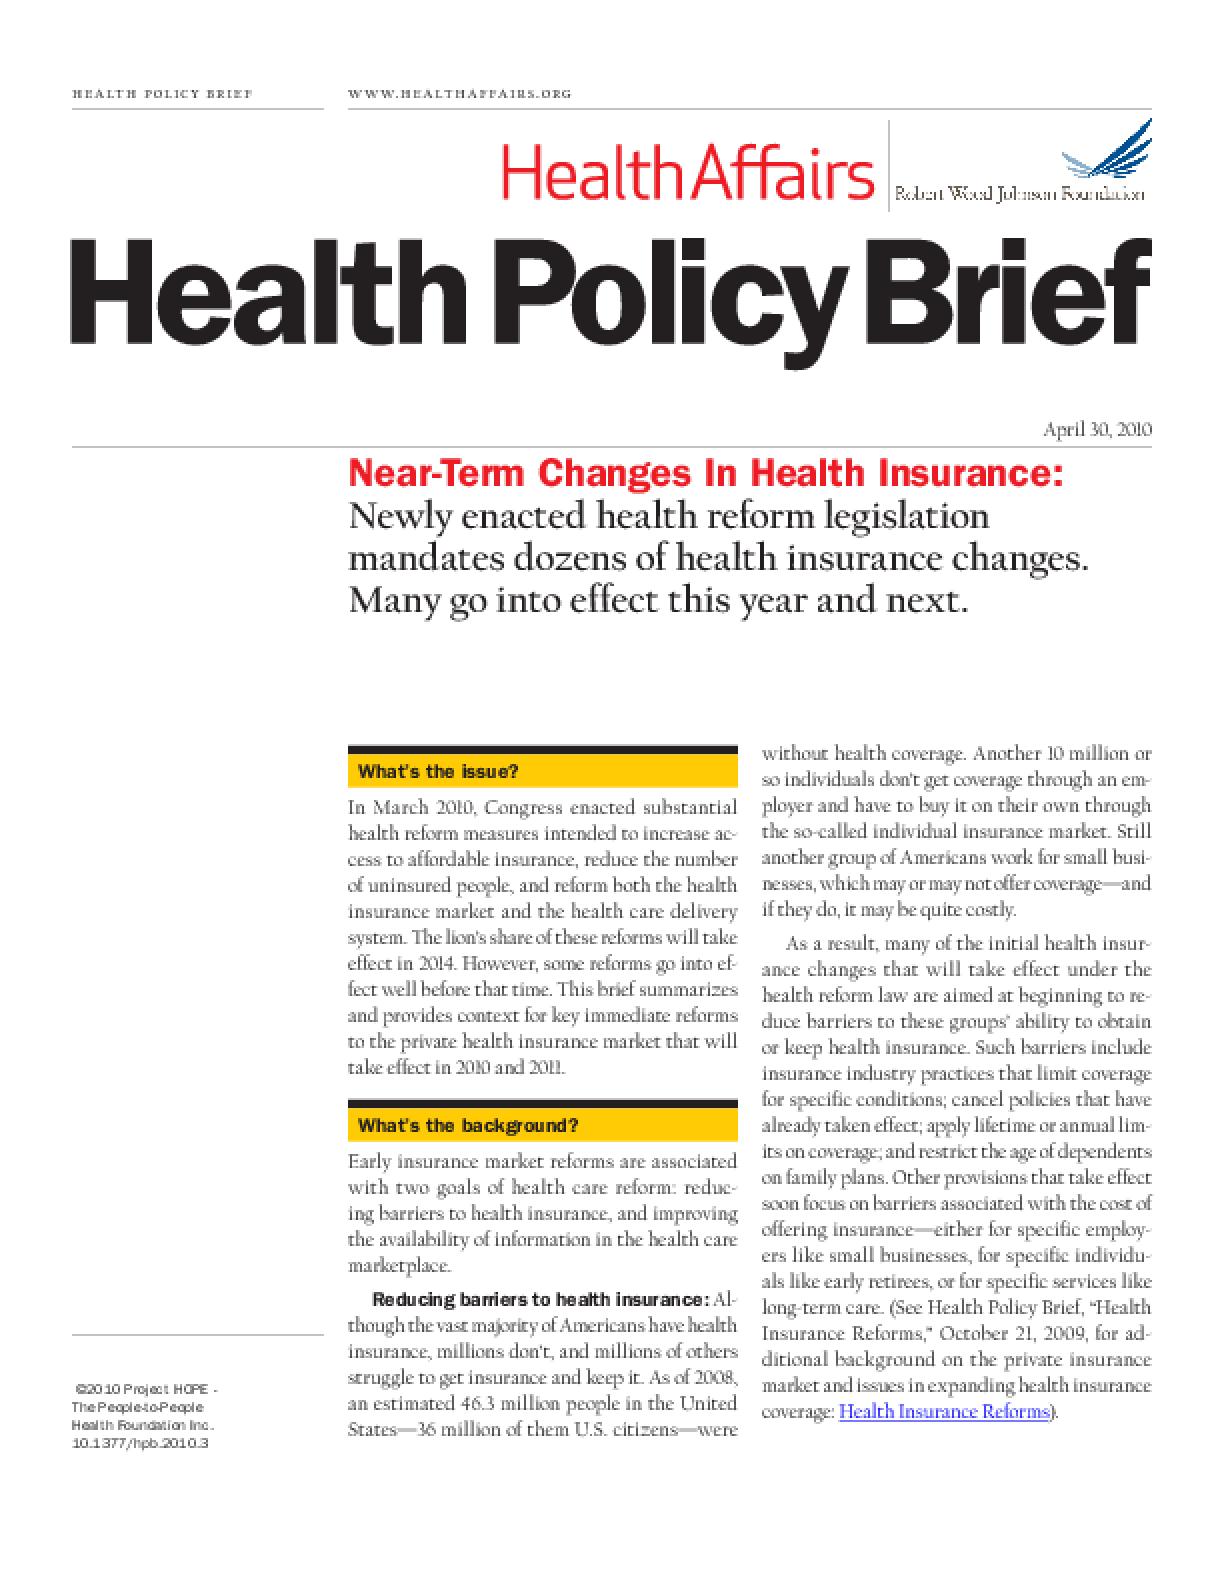 Health Affairs/RWJF Policy Brief: Near-Term Changes in Health Insurance